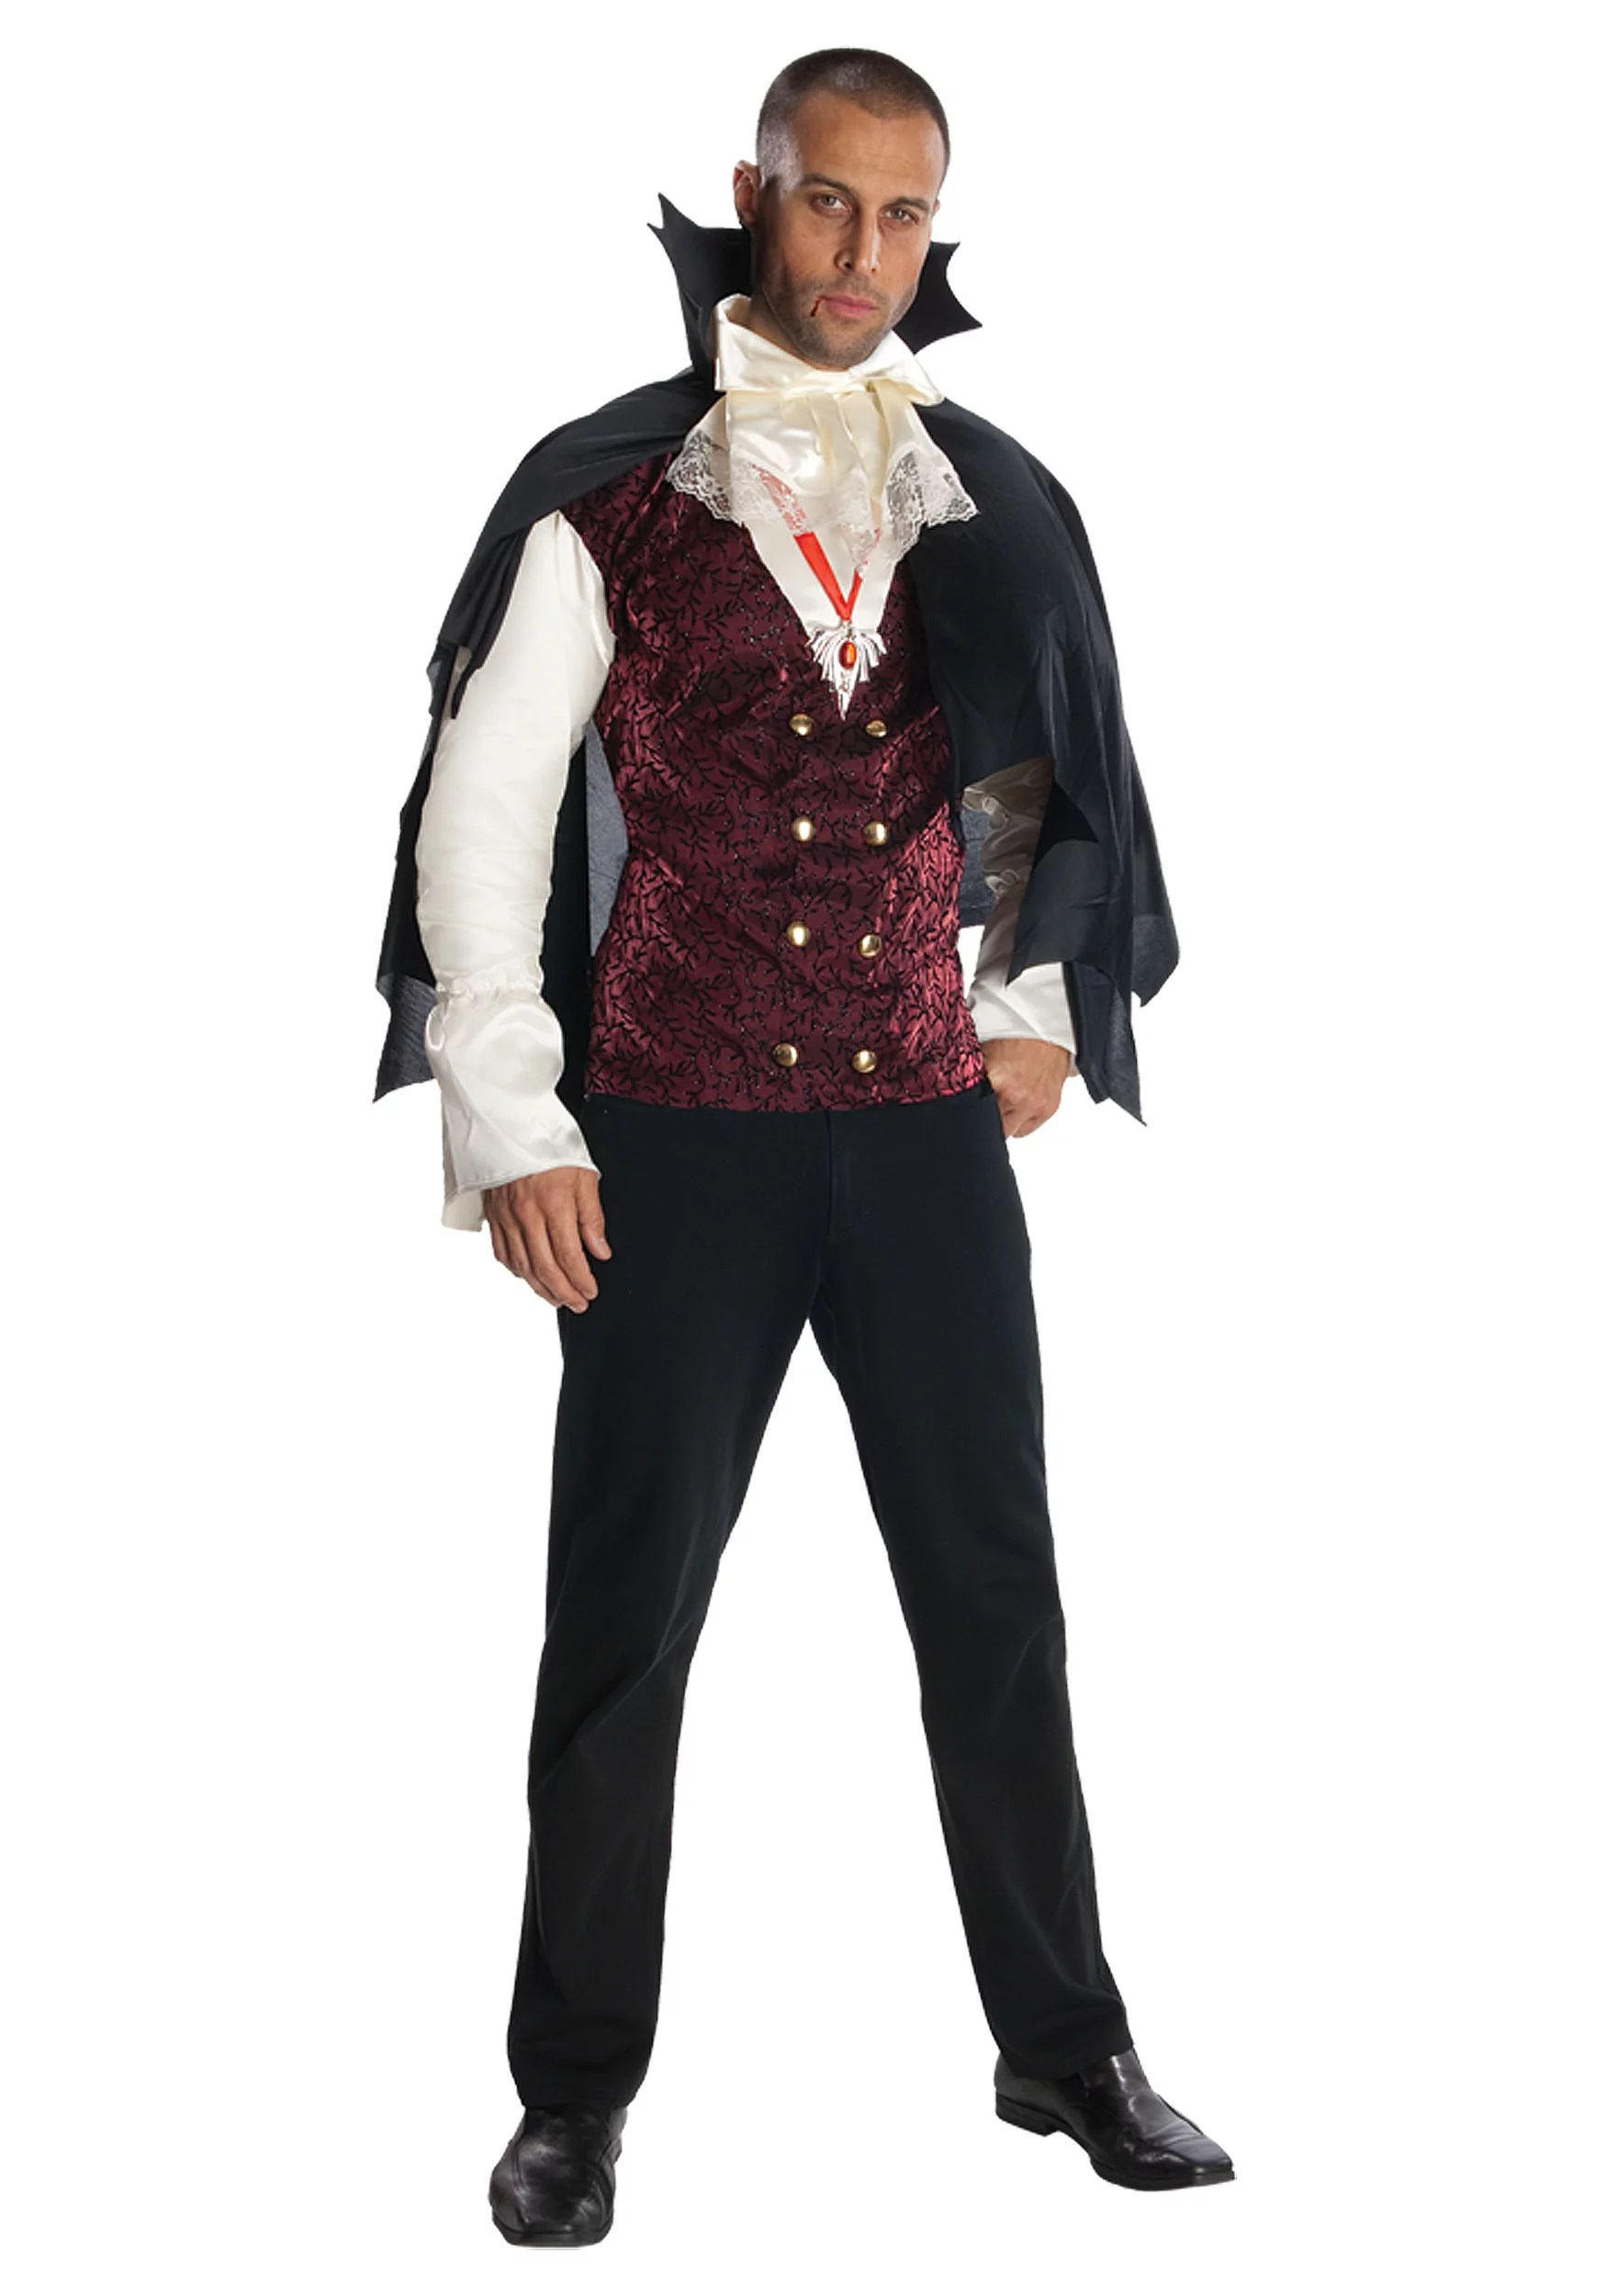 Sexy Male Vampire Costume : vampire, costume, Vampire, Count, Costume, Walmart.com